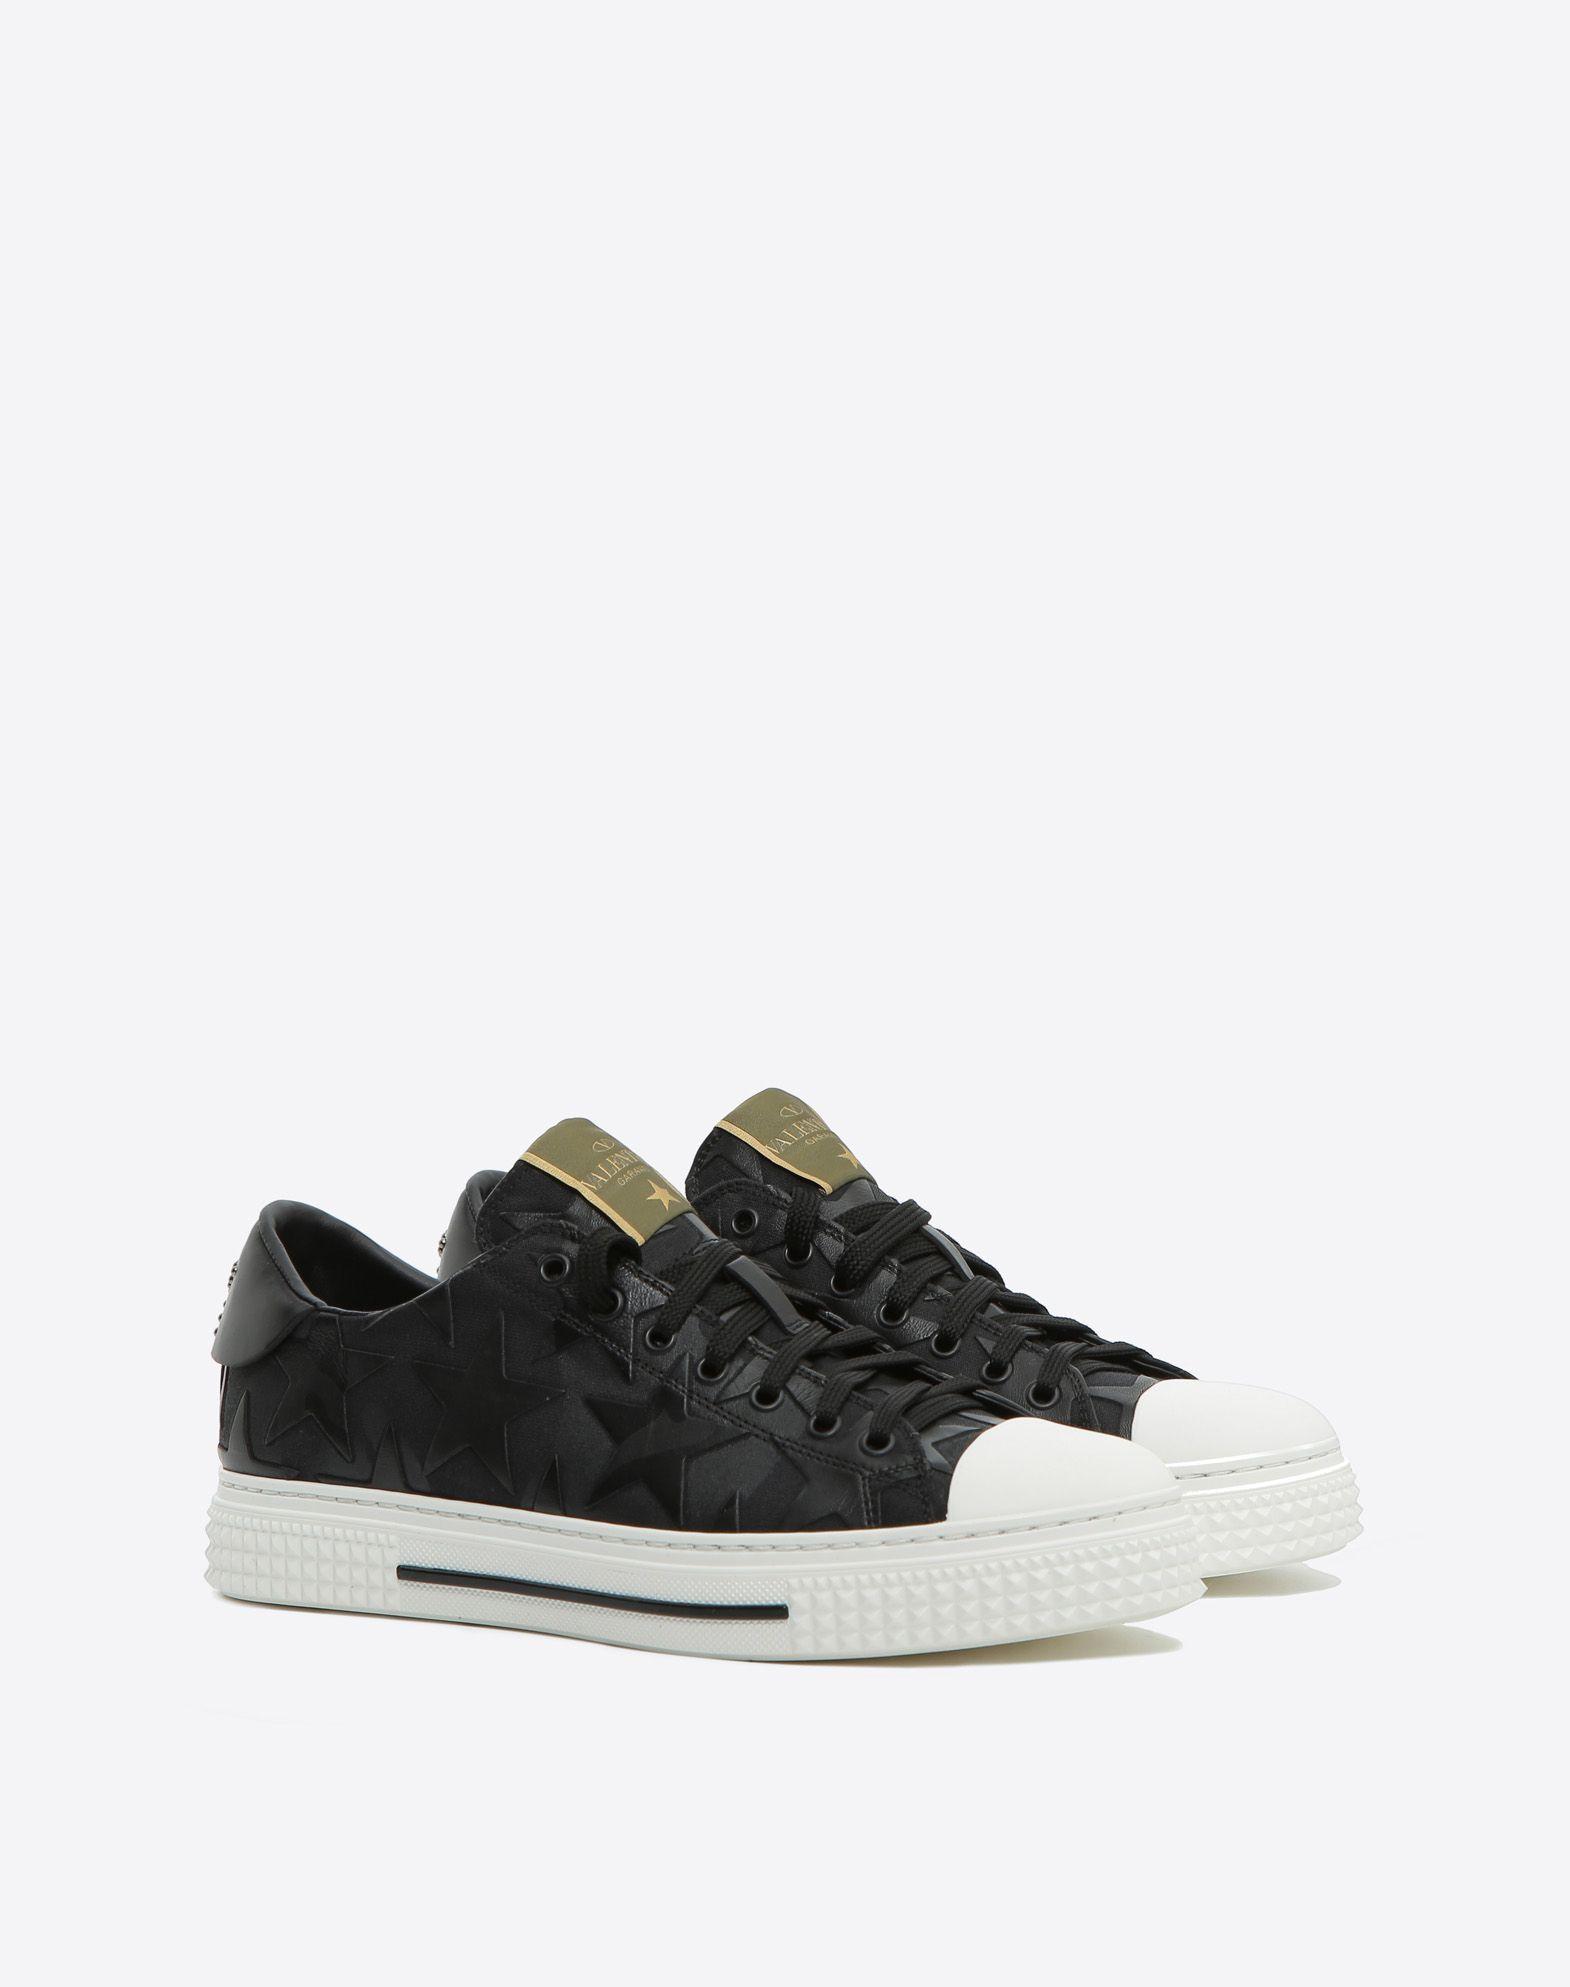 Valentino Black Suede One Star Skate Sneakers kUmlSbttbS